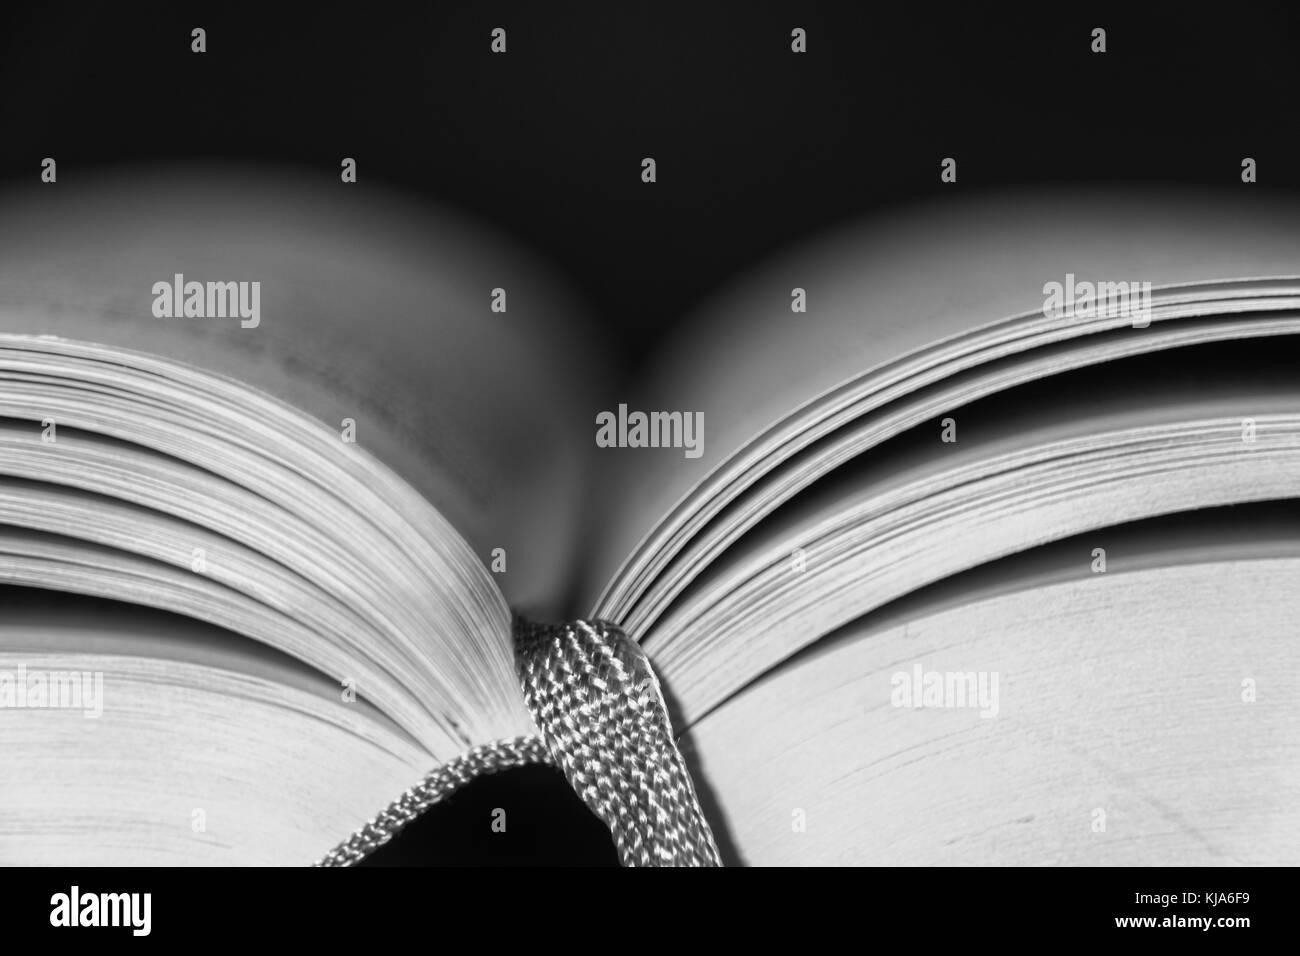 Libro Abierto con cinta Imagen De Stock